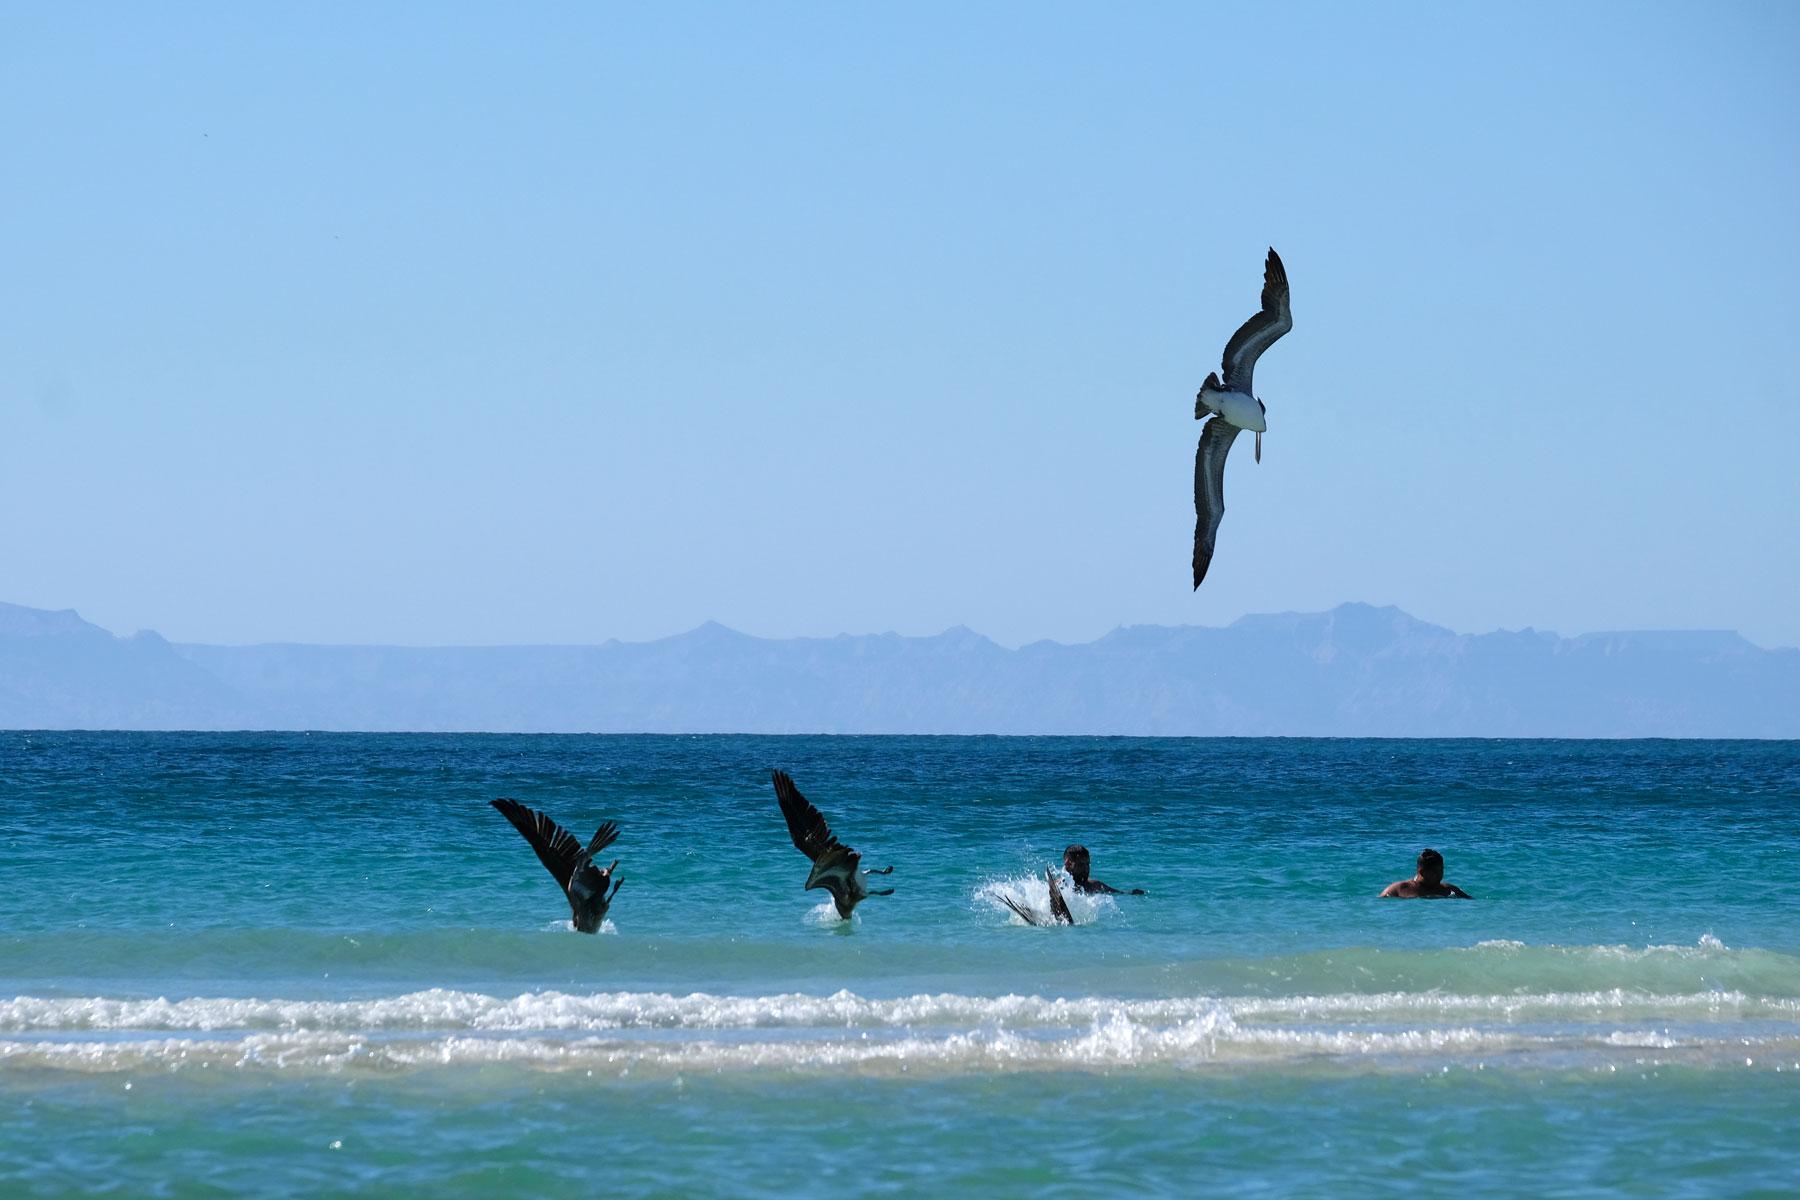 Pelikane jagen neben Schwimmern im Meer.